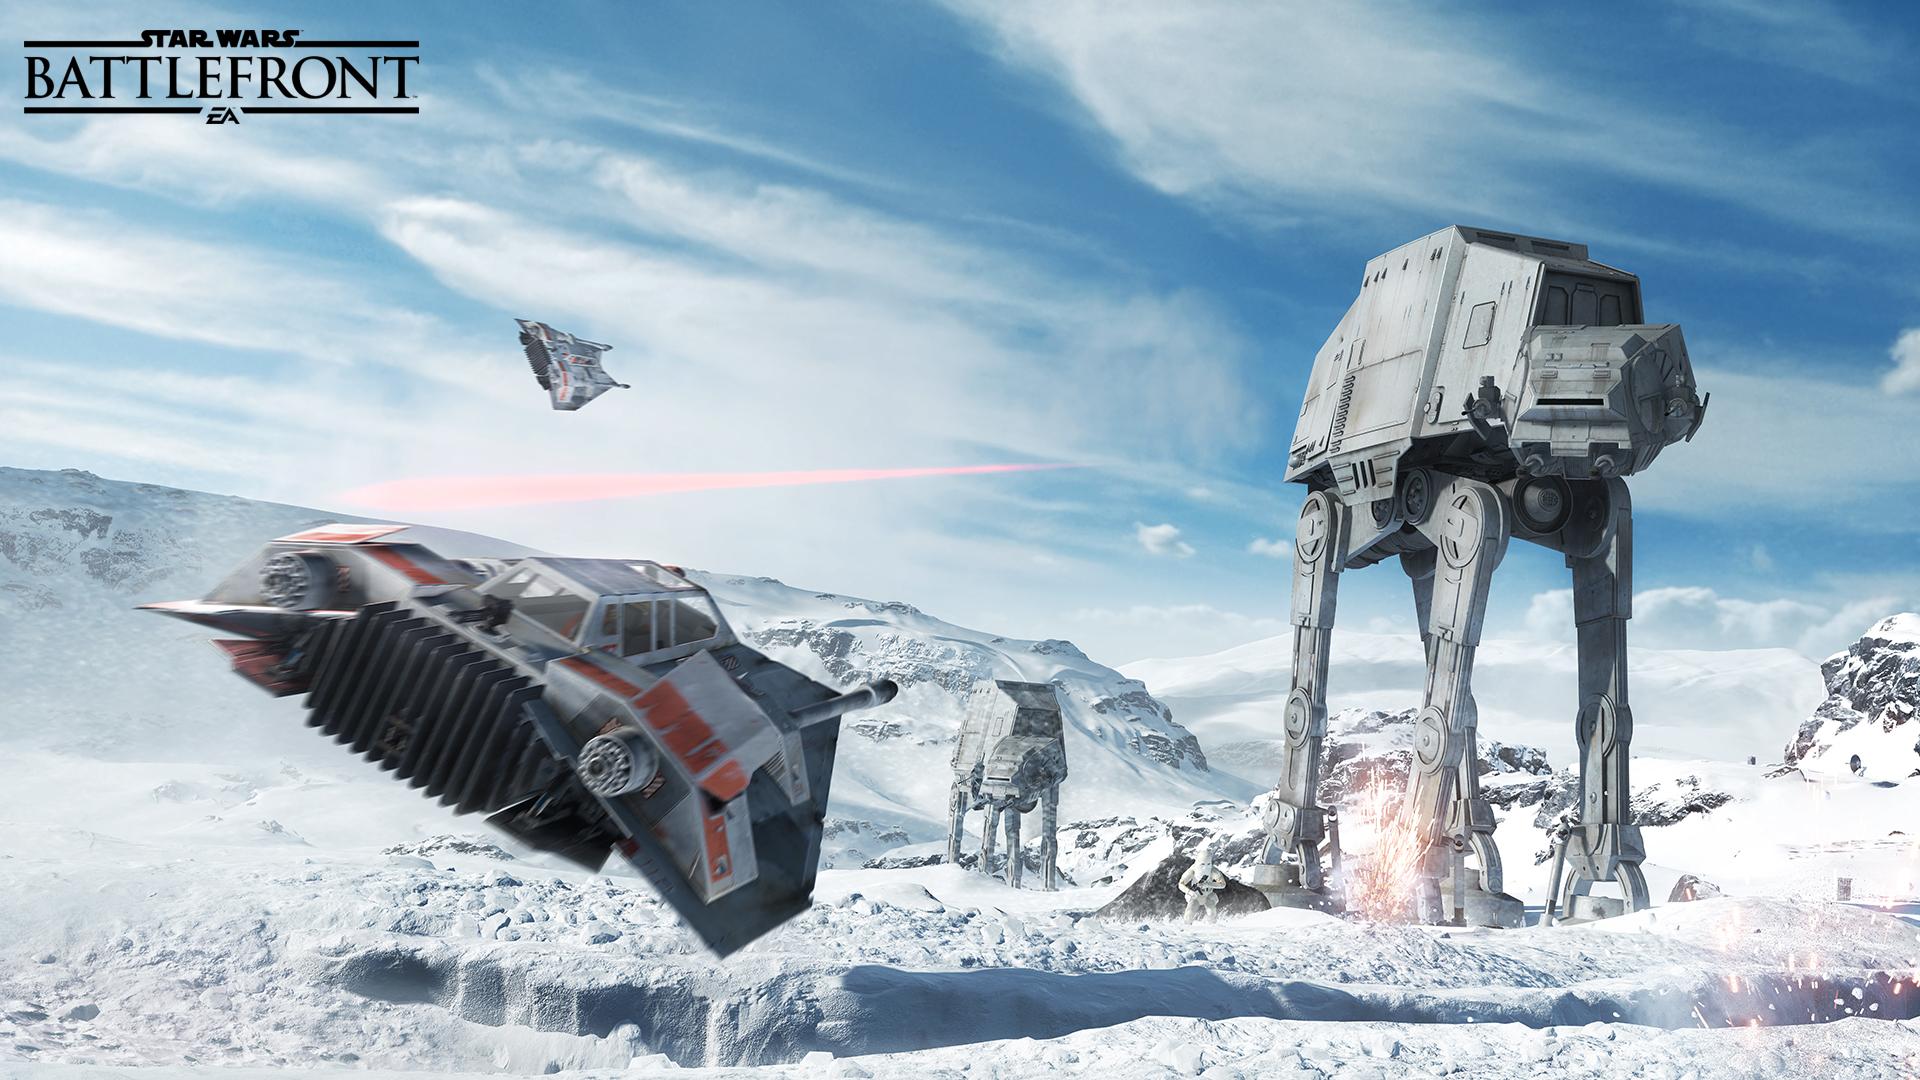 Star Wars Battlefront detalii imagini i primul trailer UPDATE 1920x1080